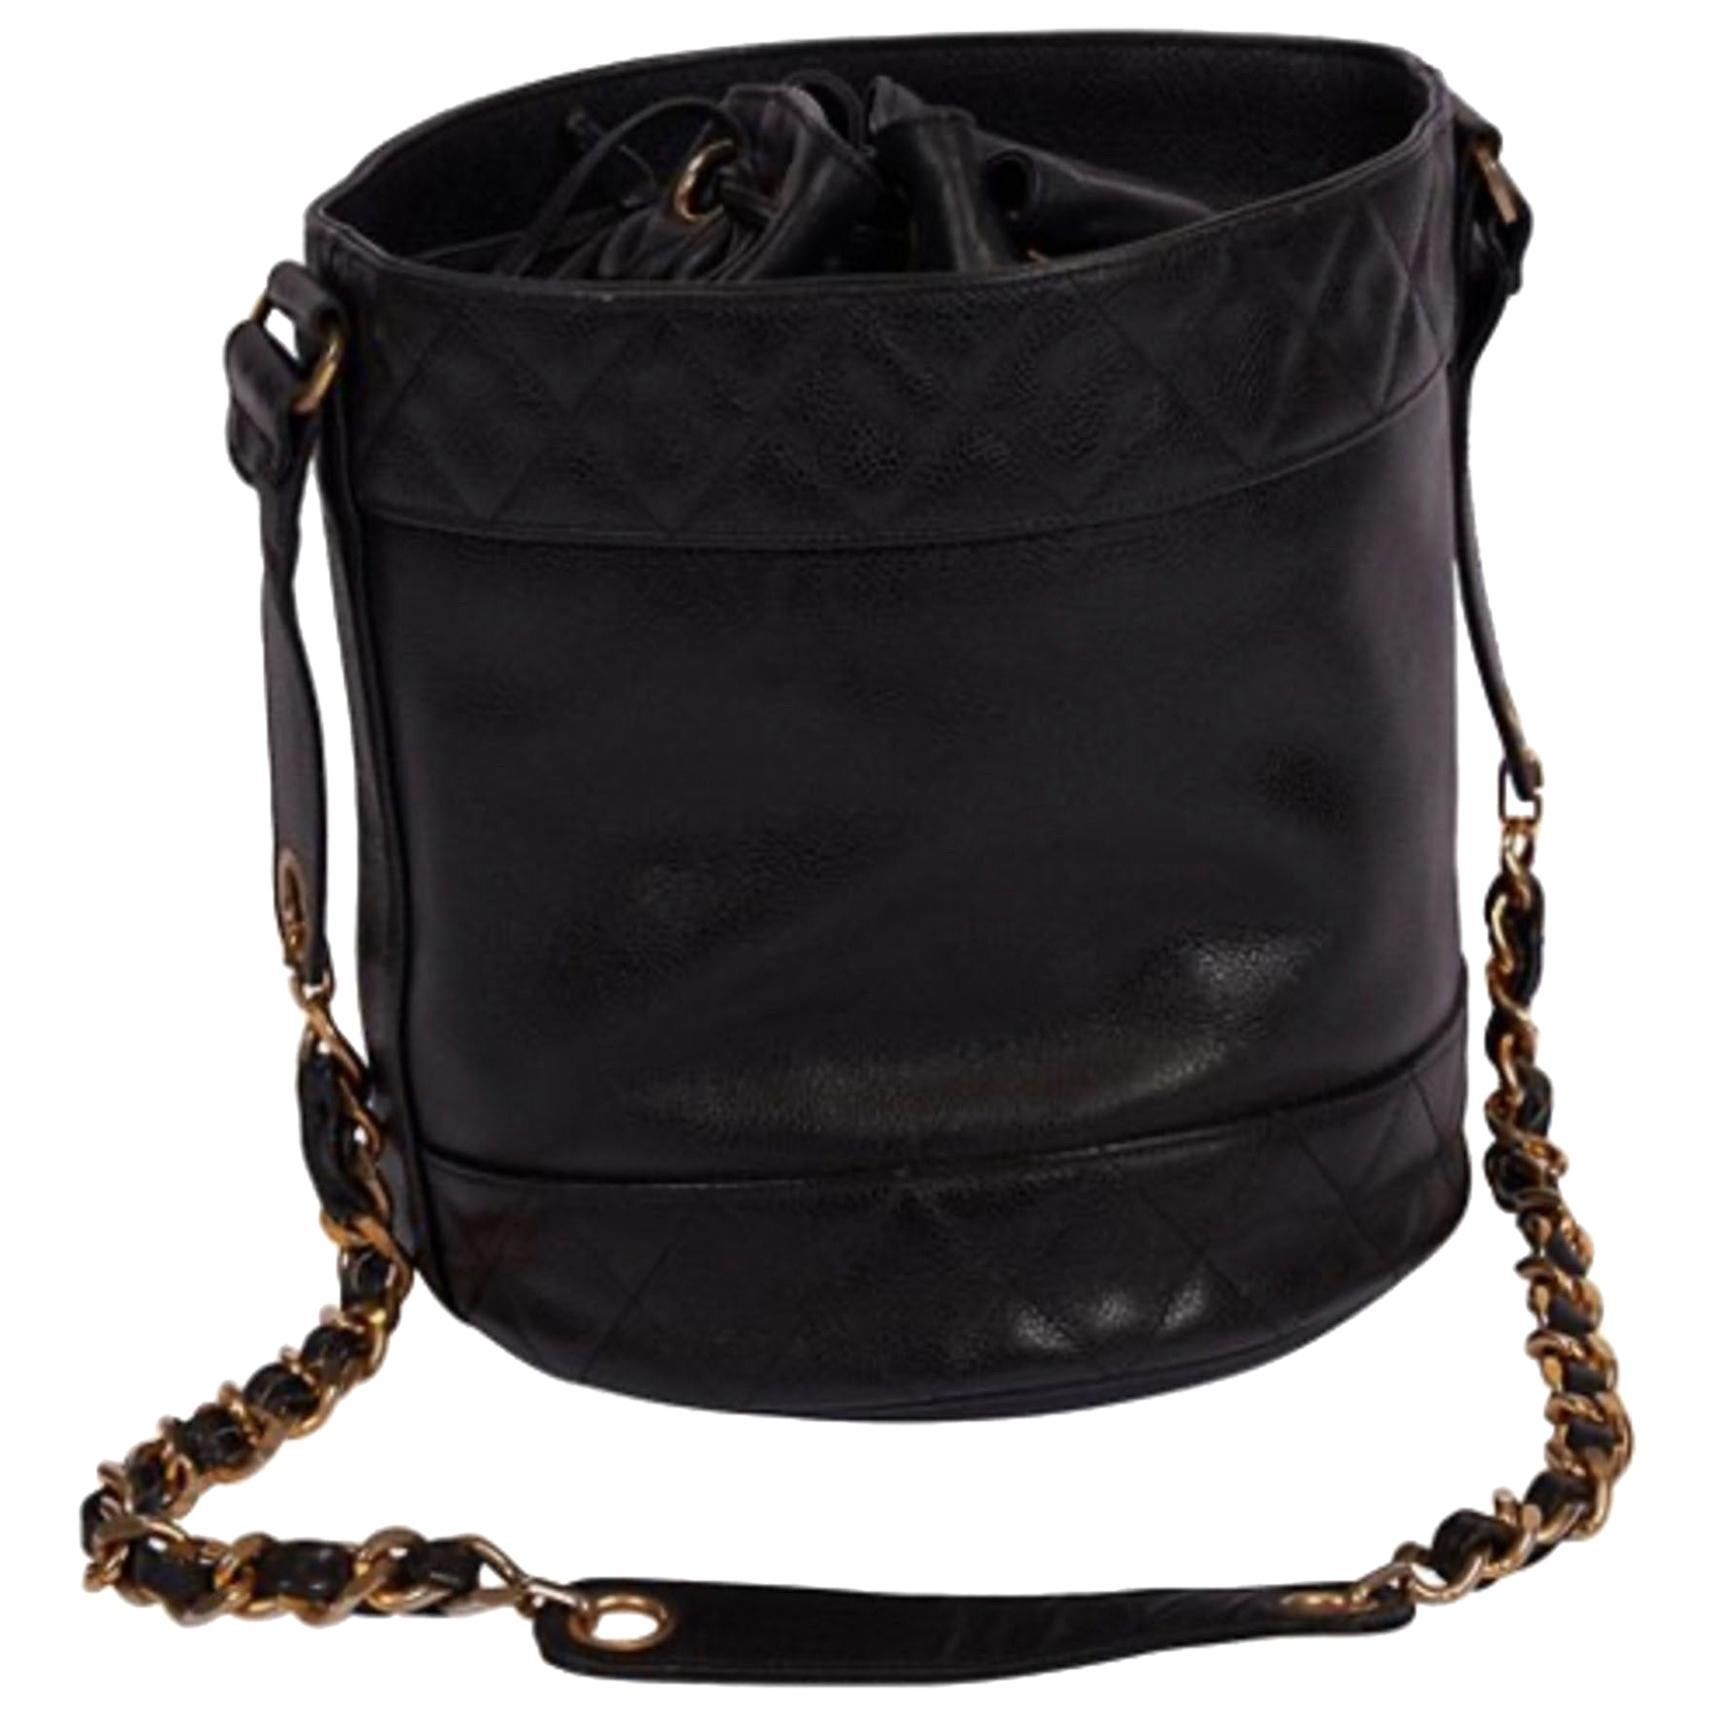 Chanel Vintage Caviar Drawstring CC Bucket Crossbody Bag